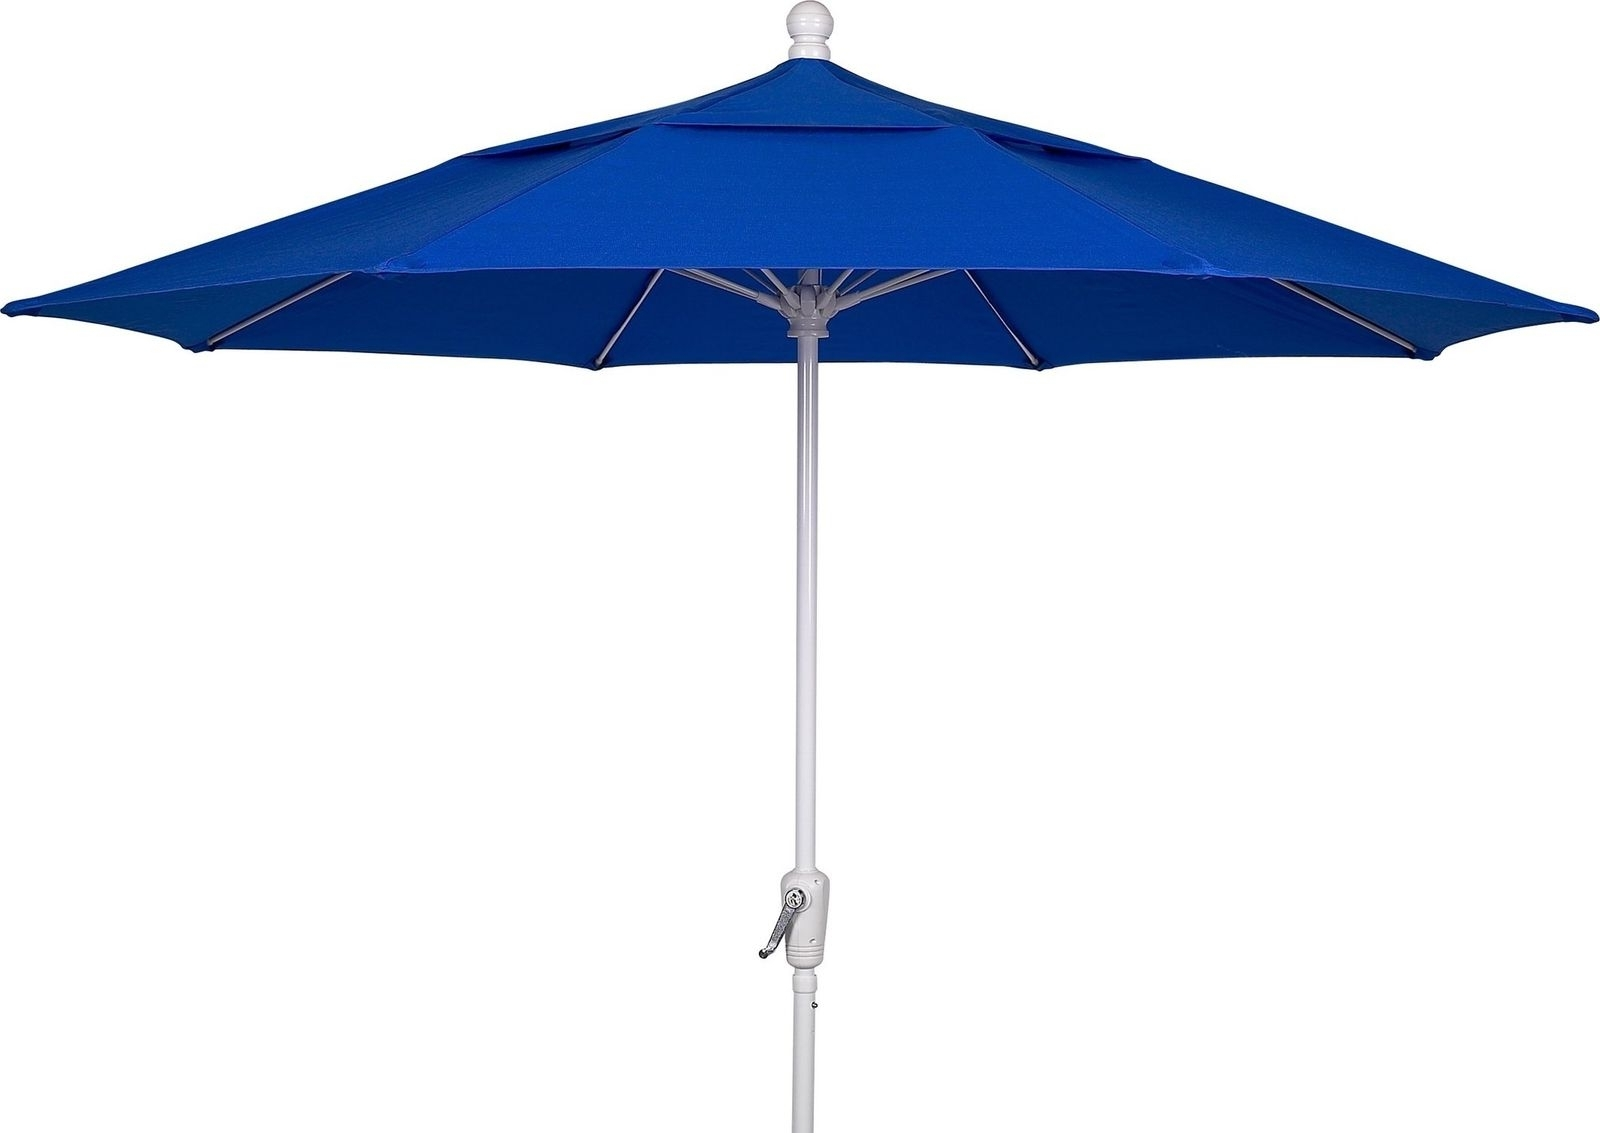 Most Recently Released Fiberbuilt Umbrellas Patio Umbrella (View 14 of 20)